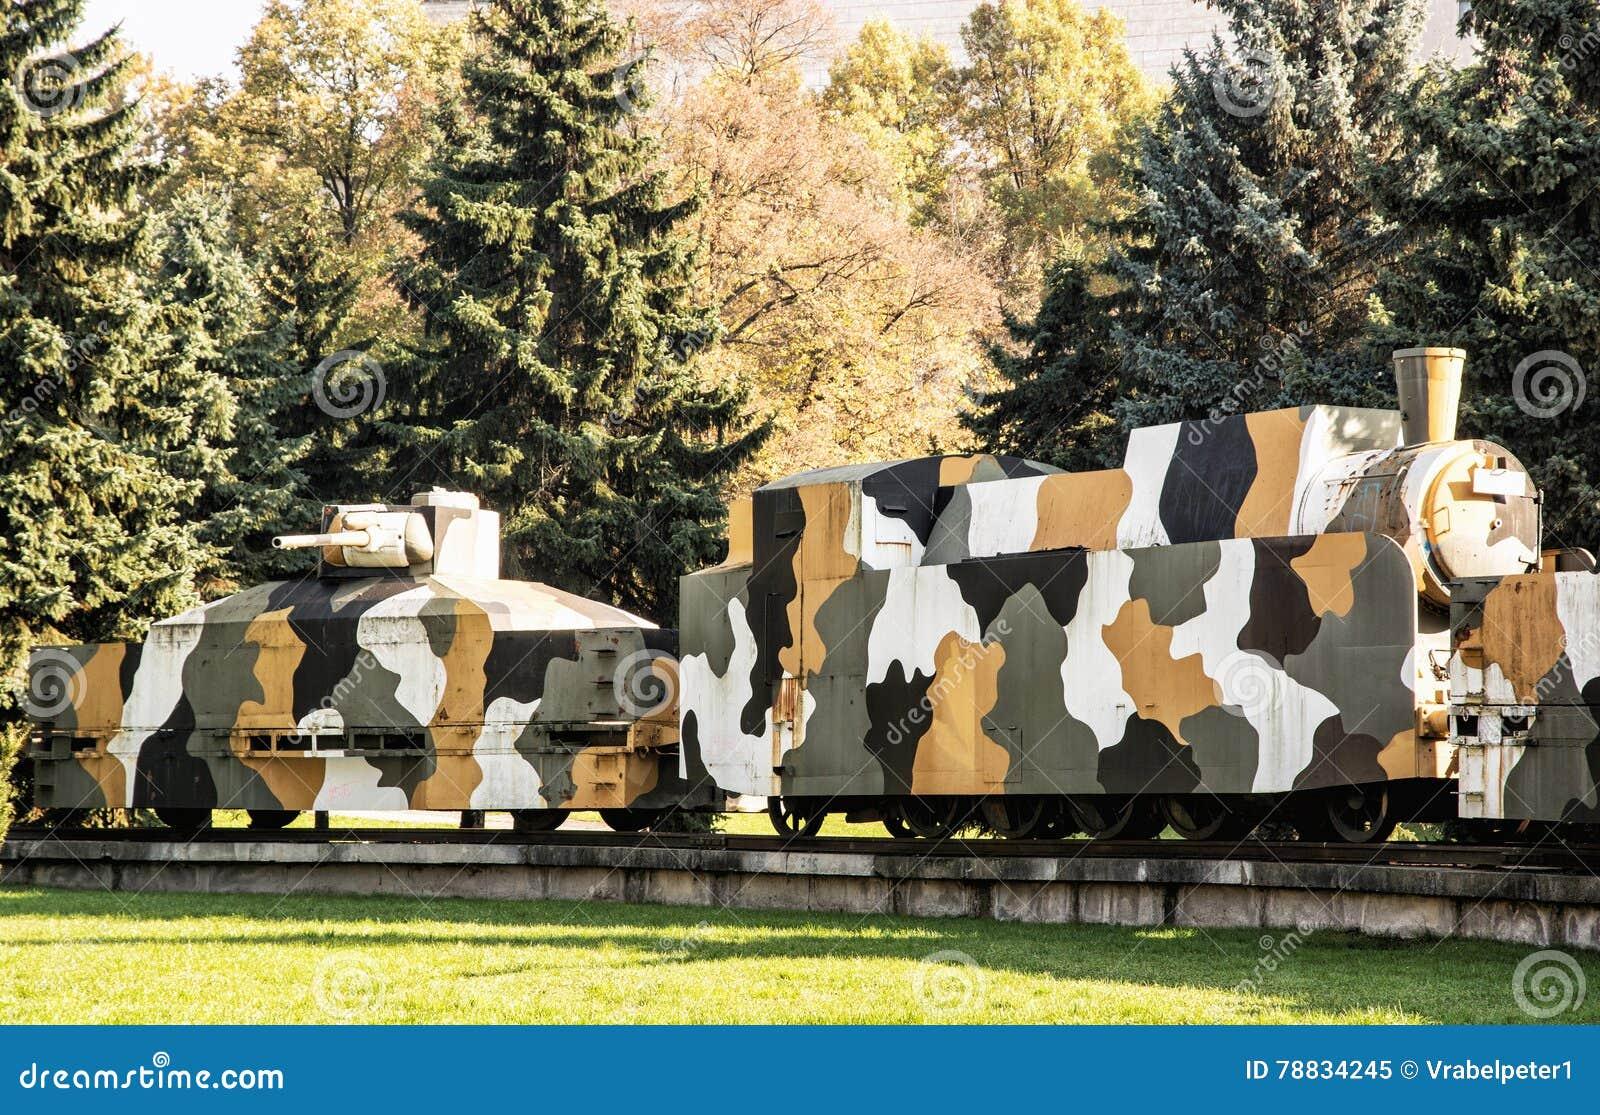 Armored Train Hurban In Zvolen, Slovakia, World War II Memorial